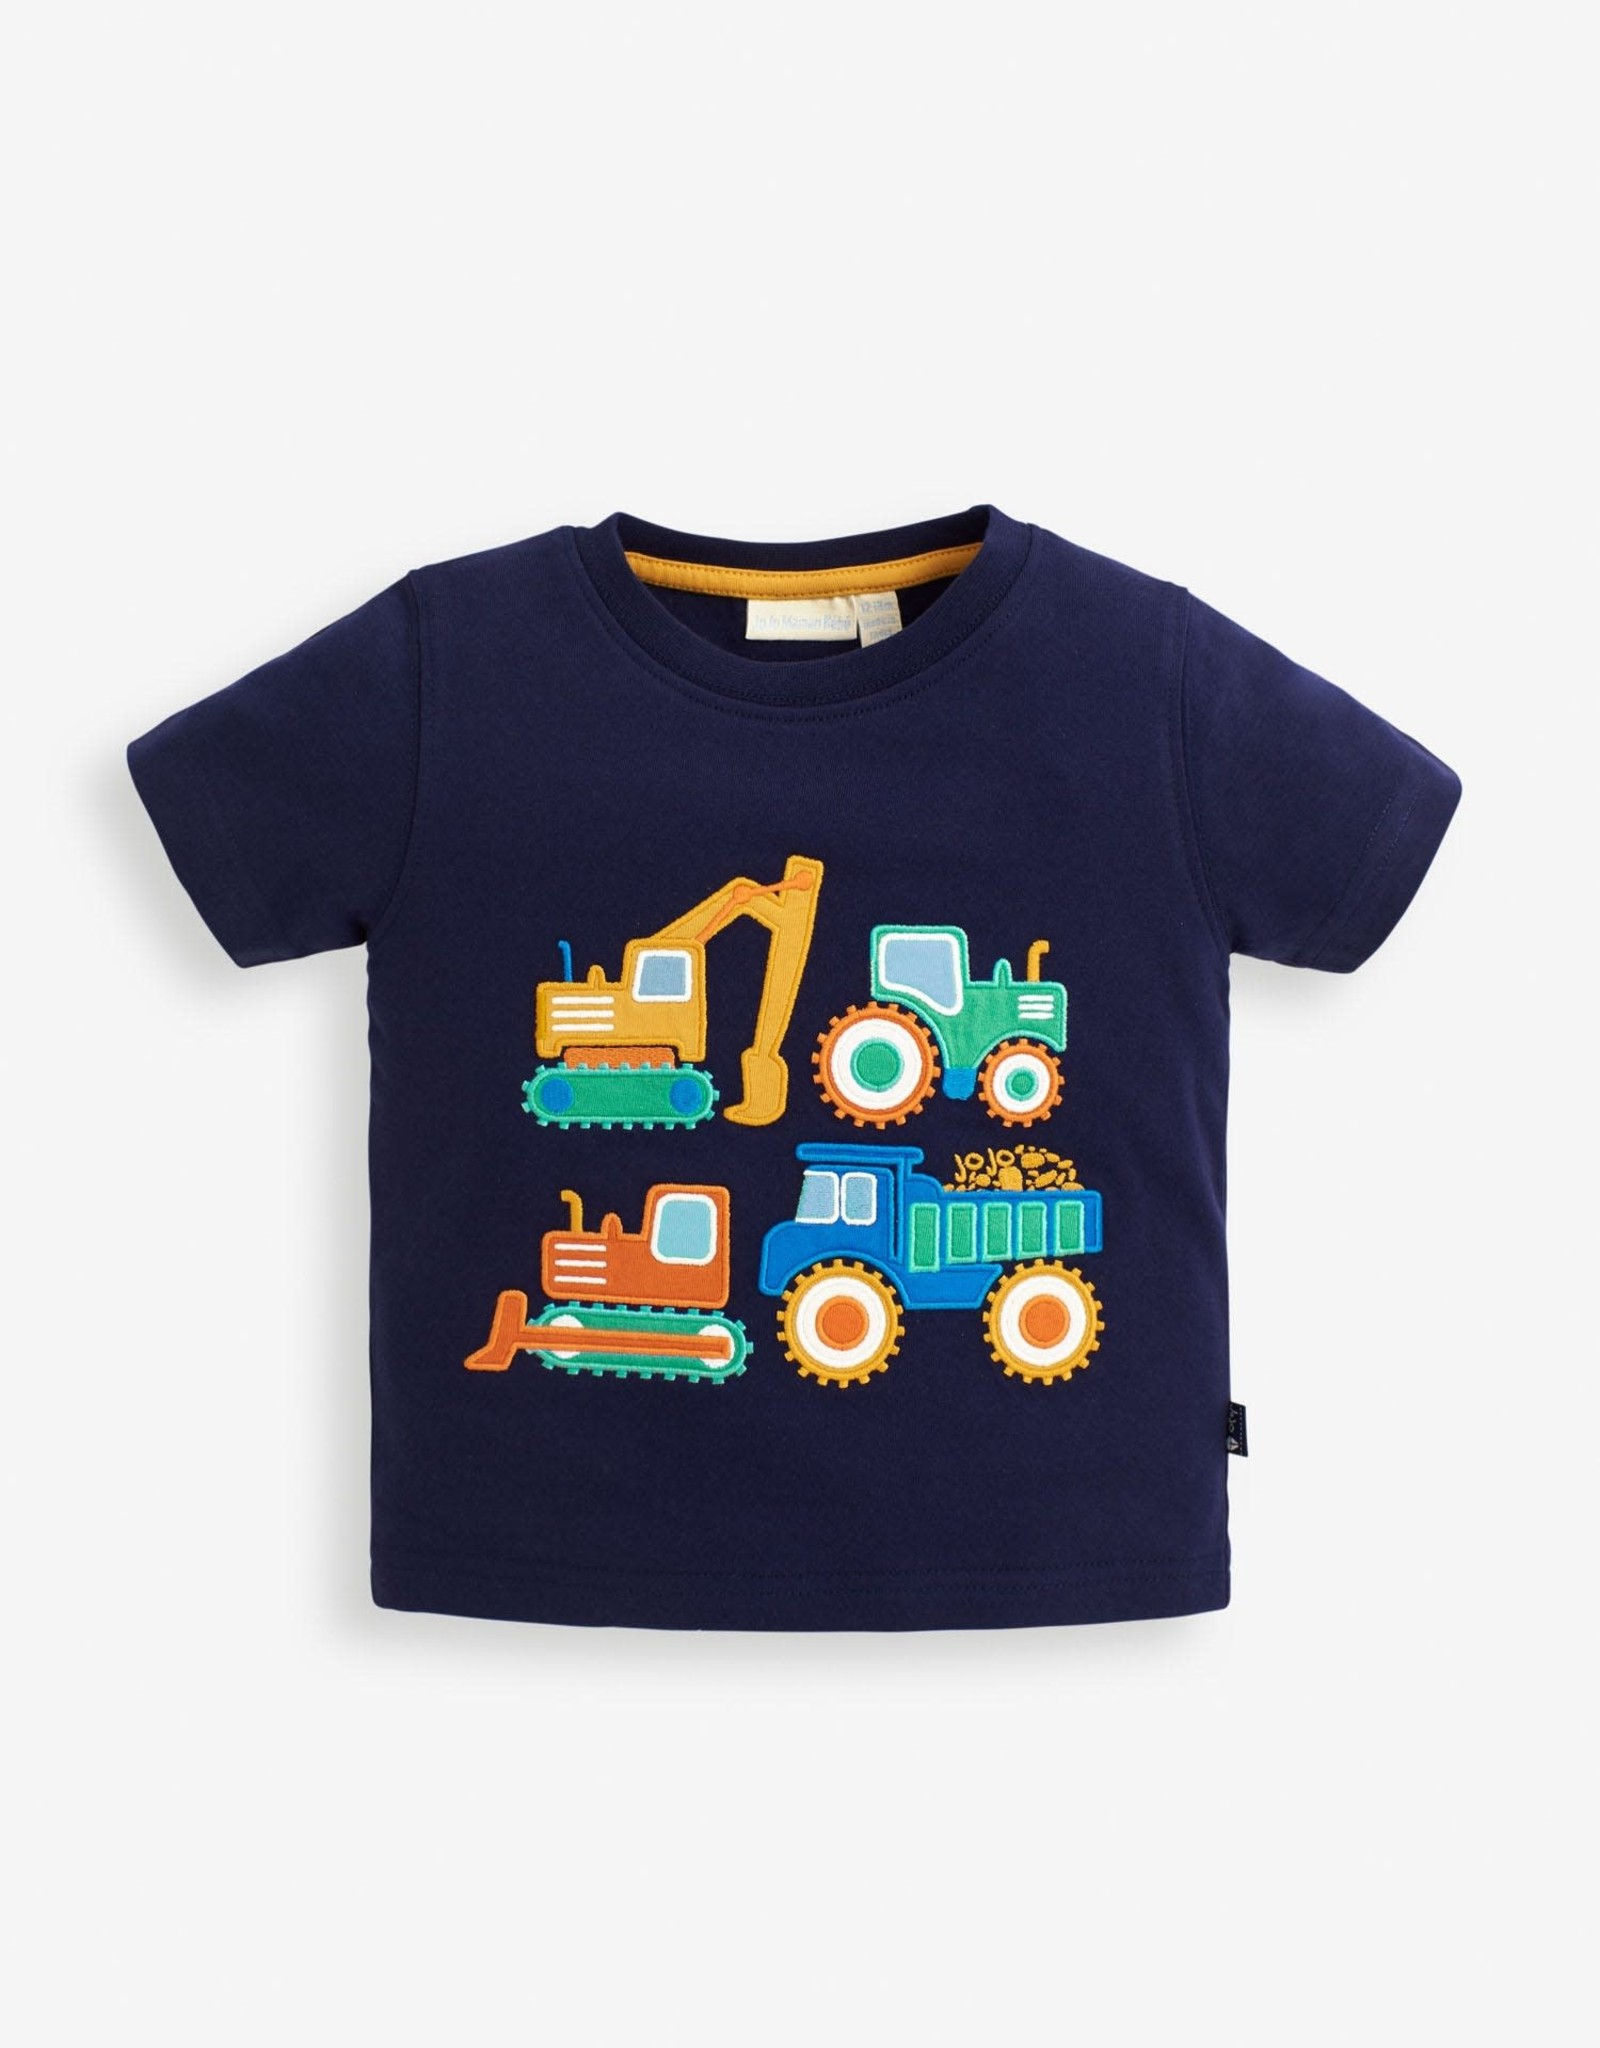 Jojo Construction Truck Applique Tee Shirt, Navy